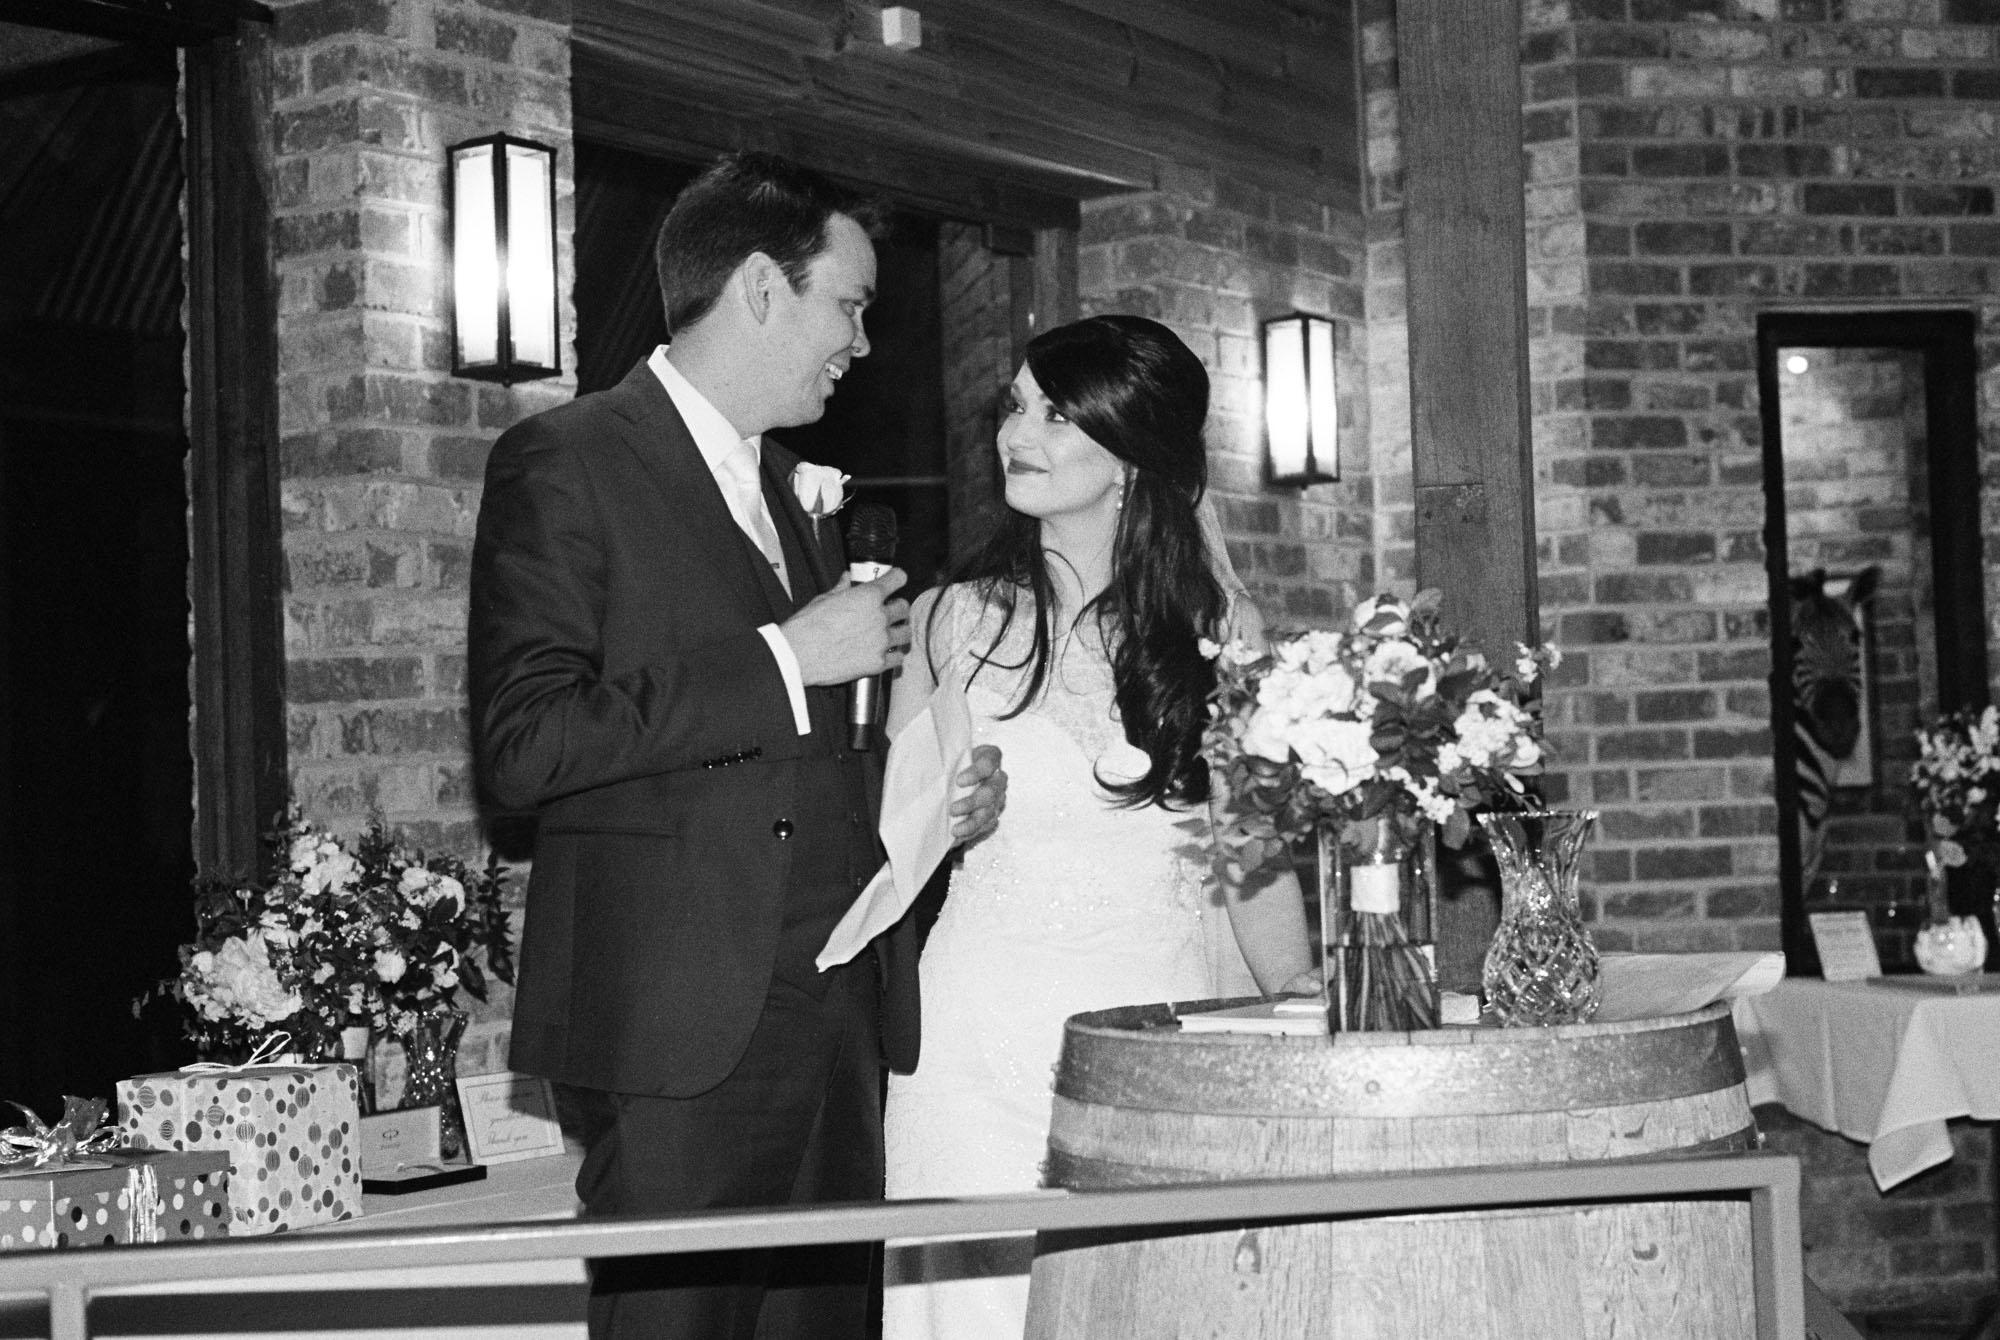 Glen-Ewin-Estate-wedding-photography-097.jpg